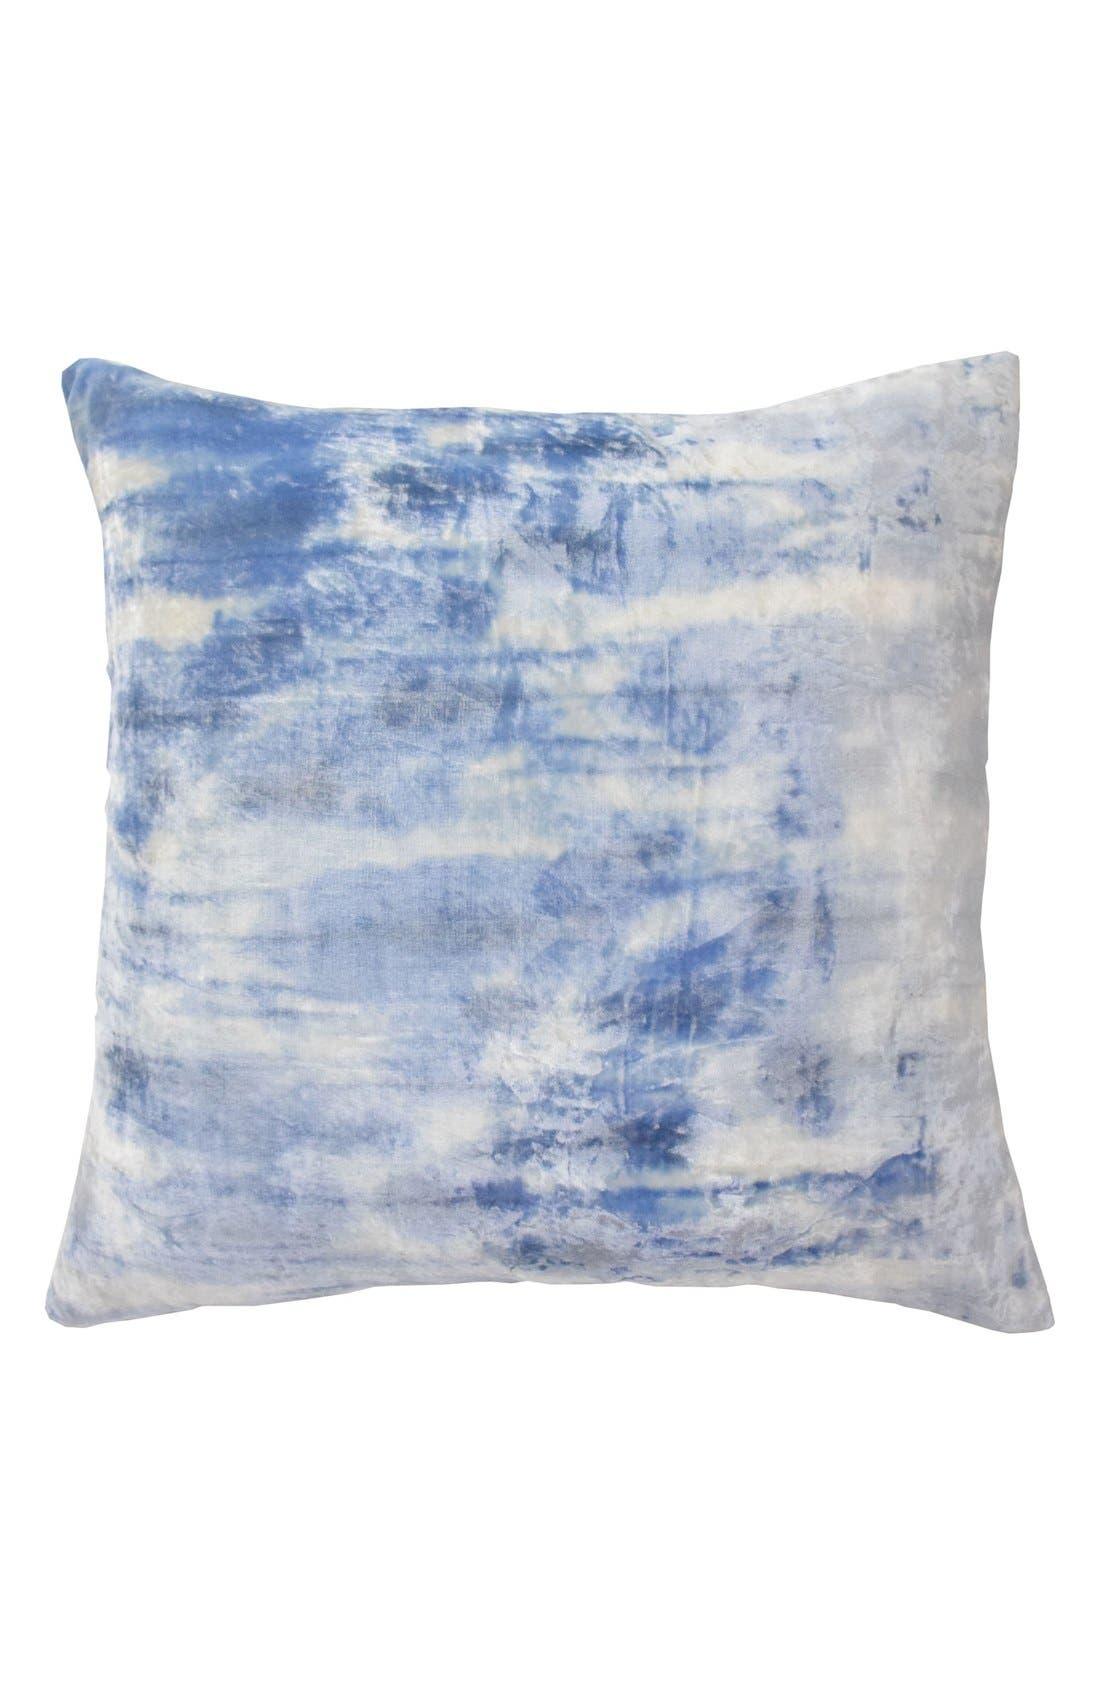 Alternate Image 1 Selected - Blissliving Home 'Cielo' Pillow